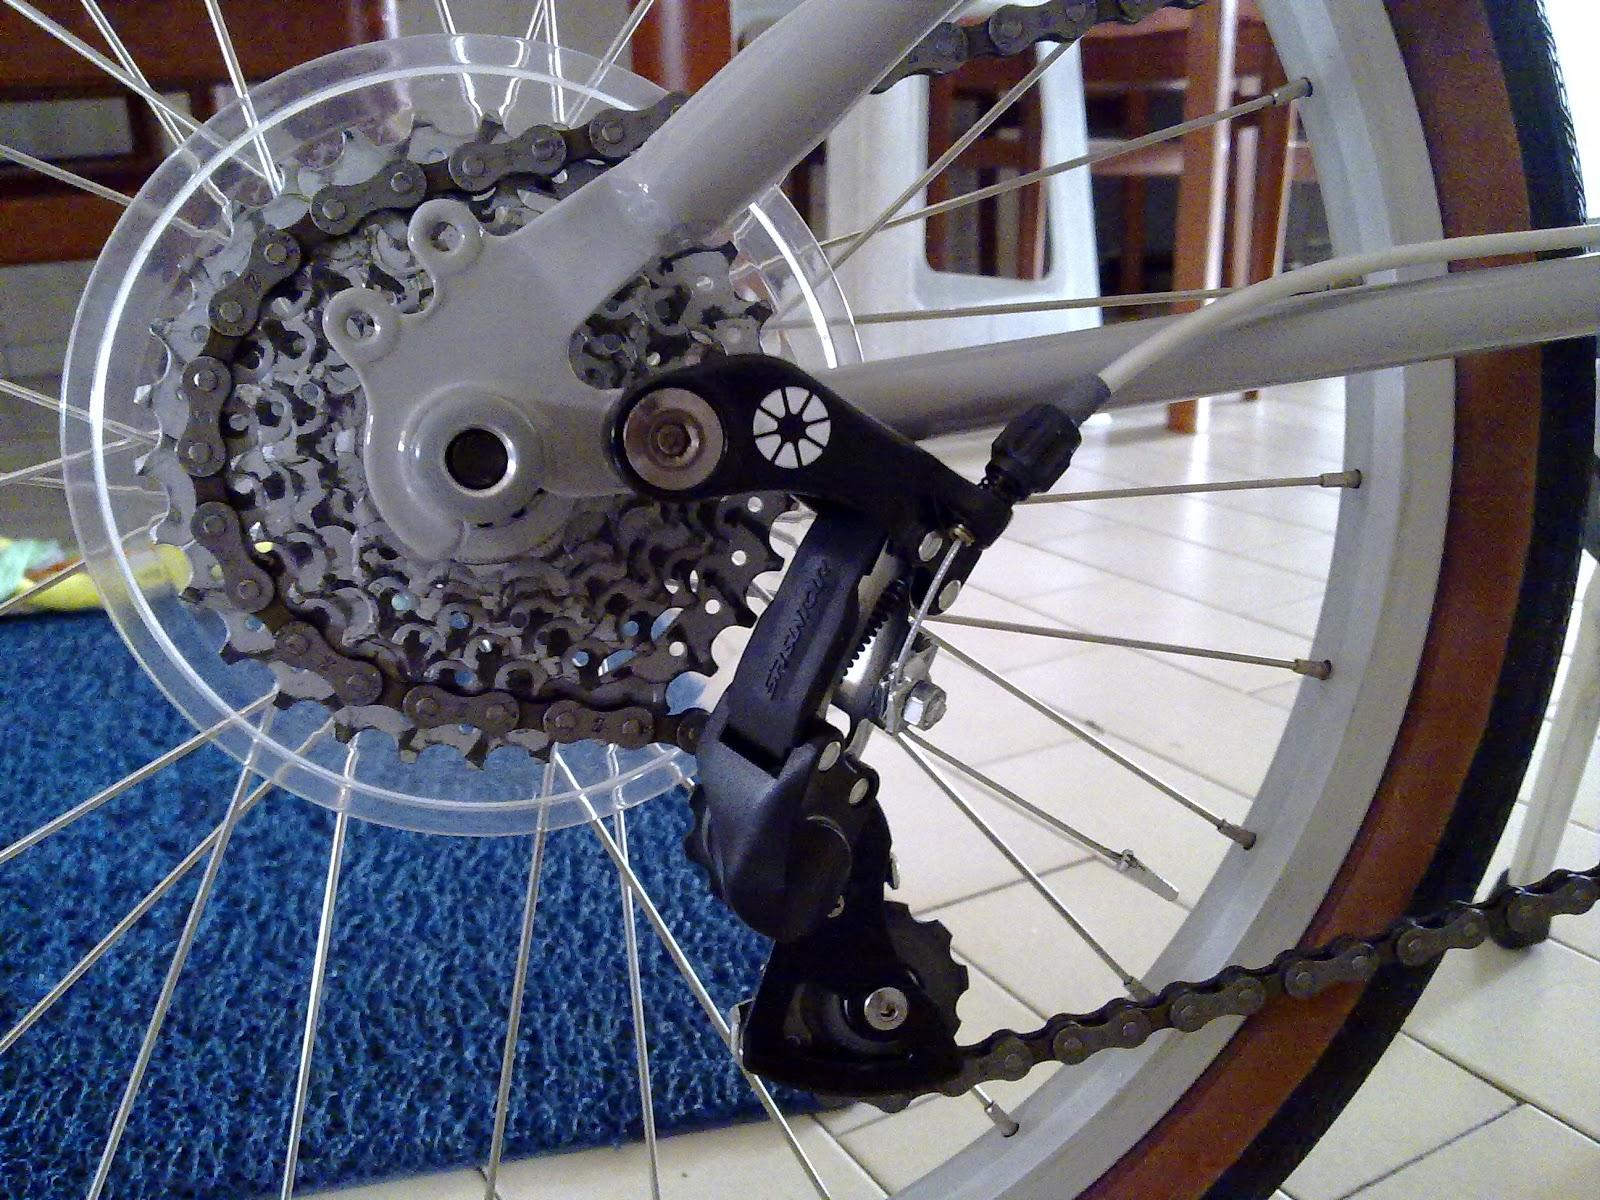 New  DAHON RD-3500-SS Road Bike Rear 9-Speed Short Cage Derailleur DAHON Part